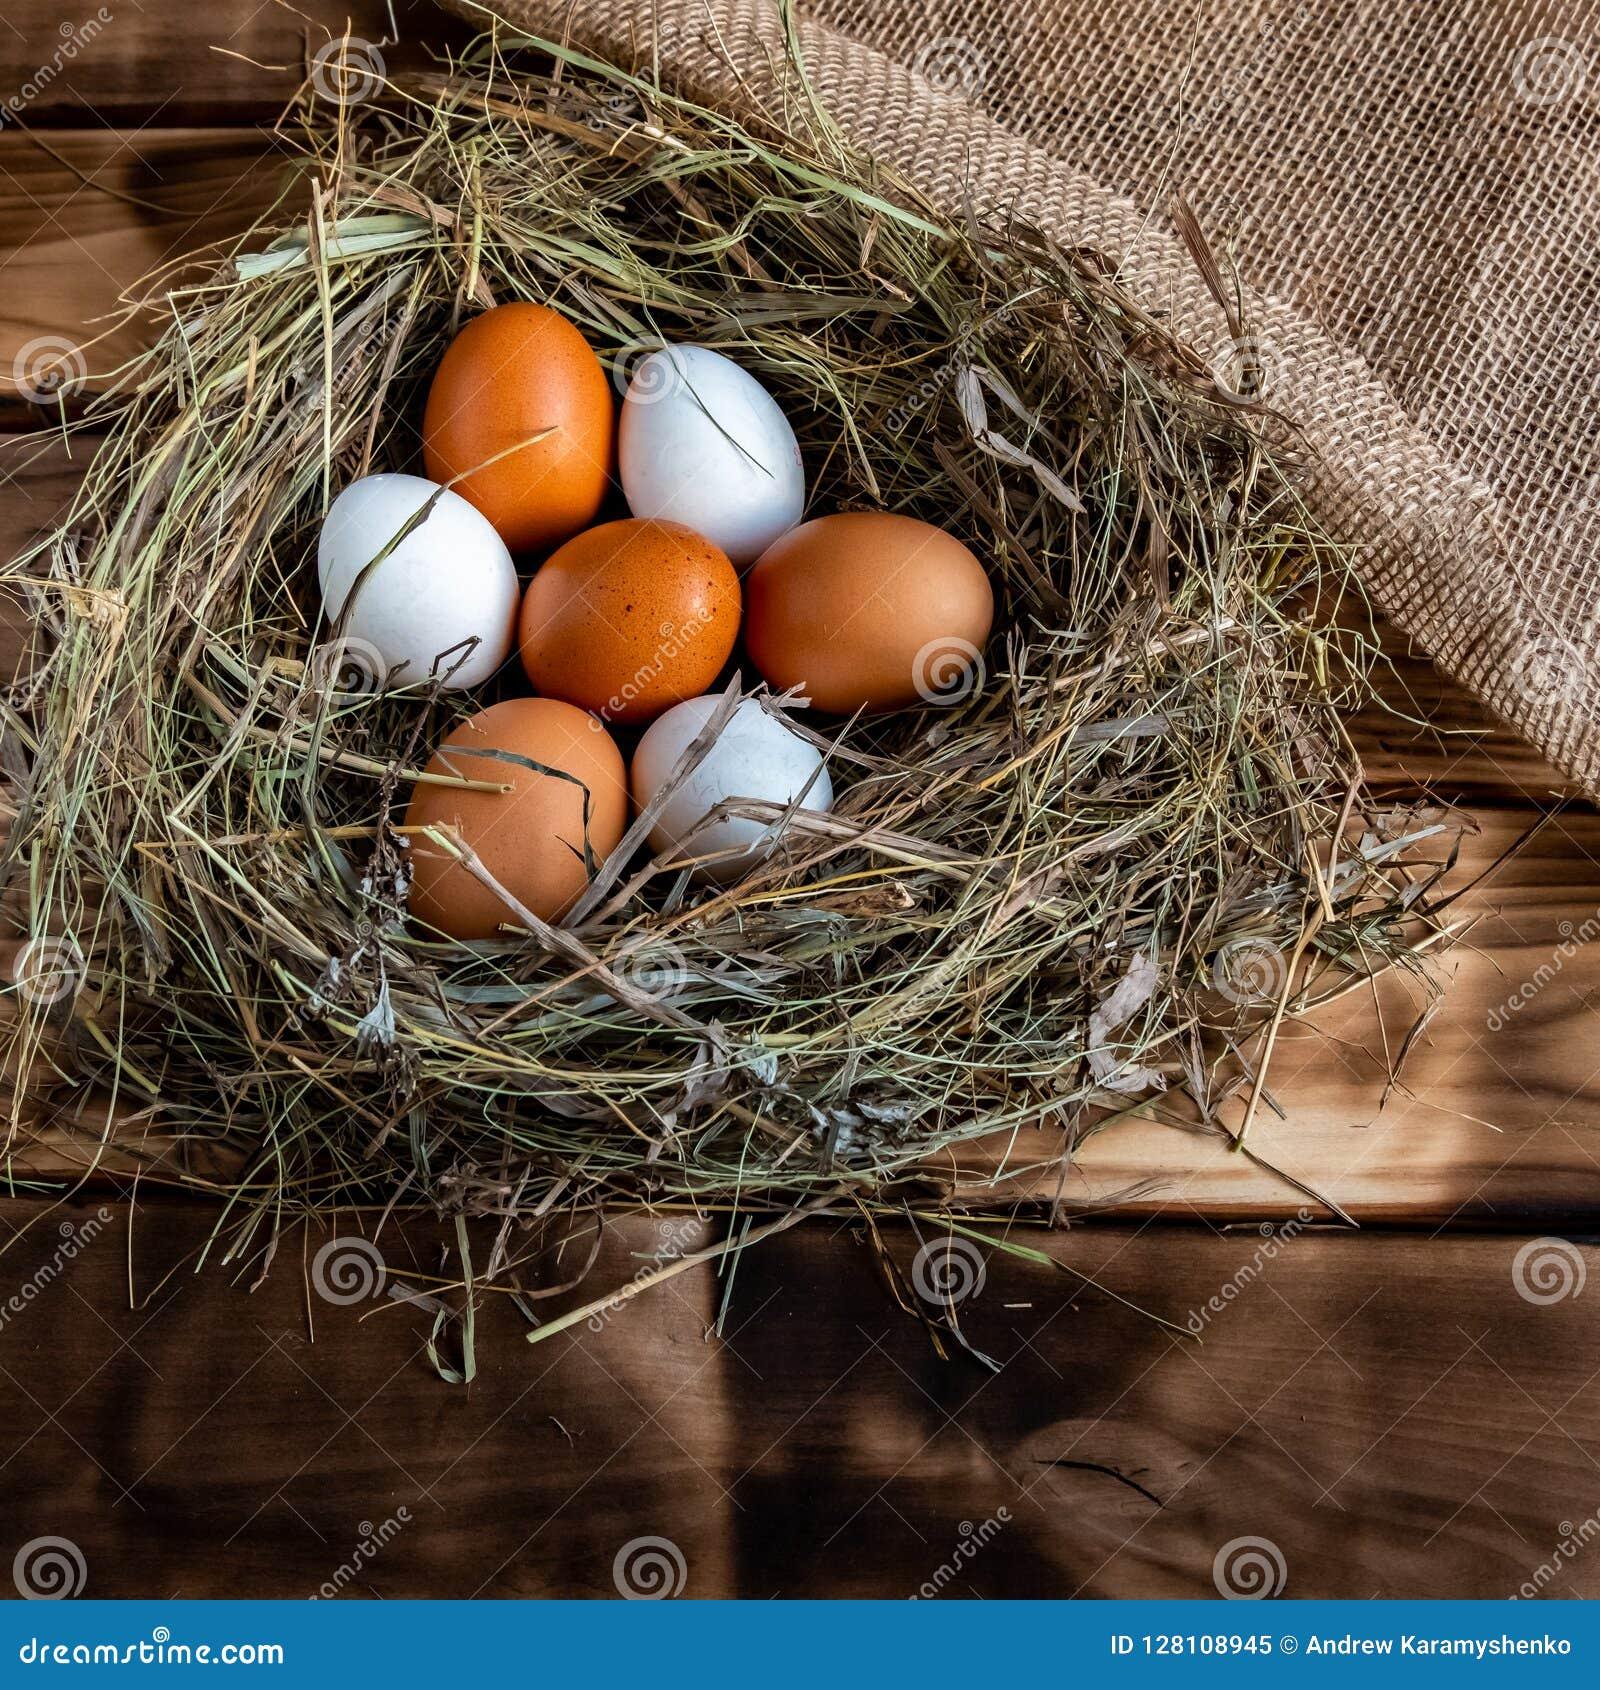 Chicken egg in the nest